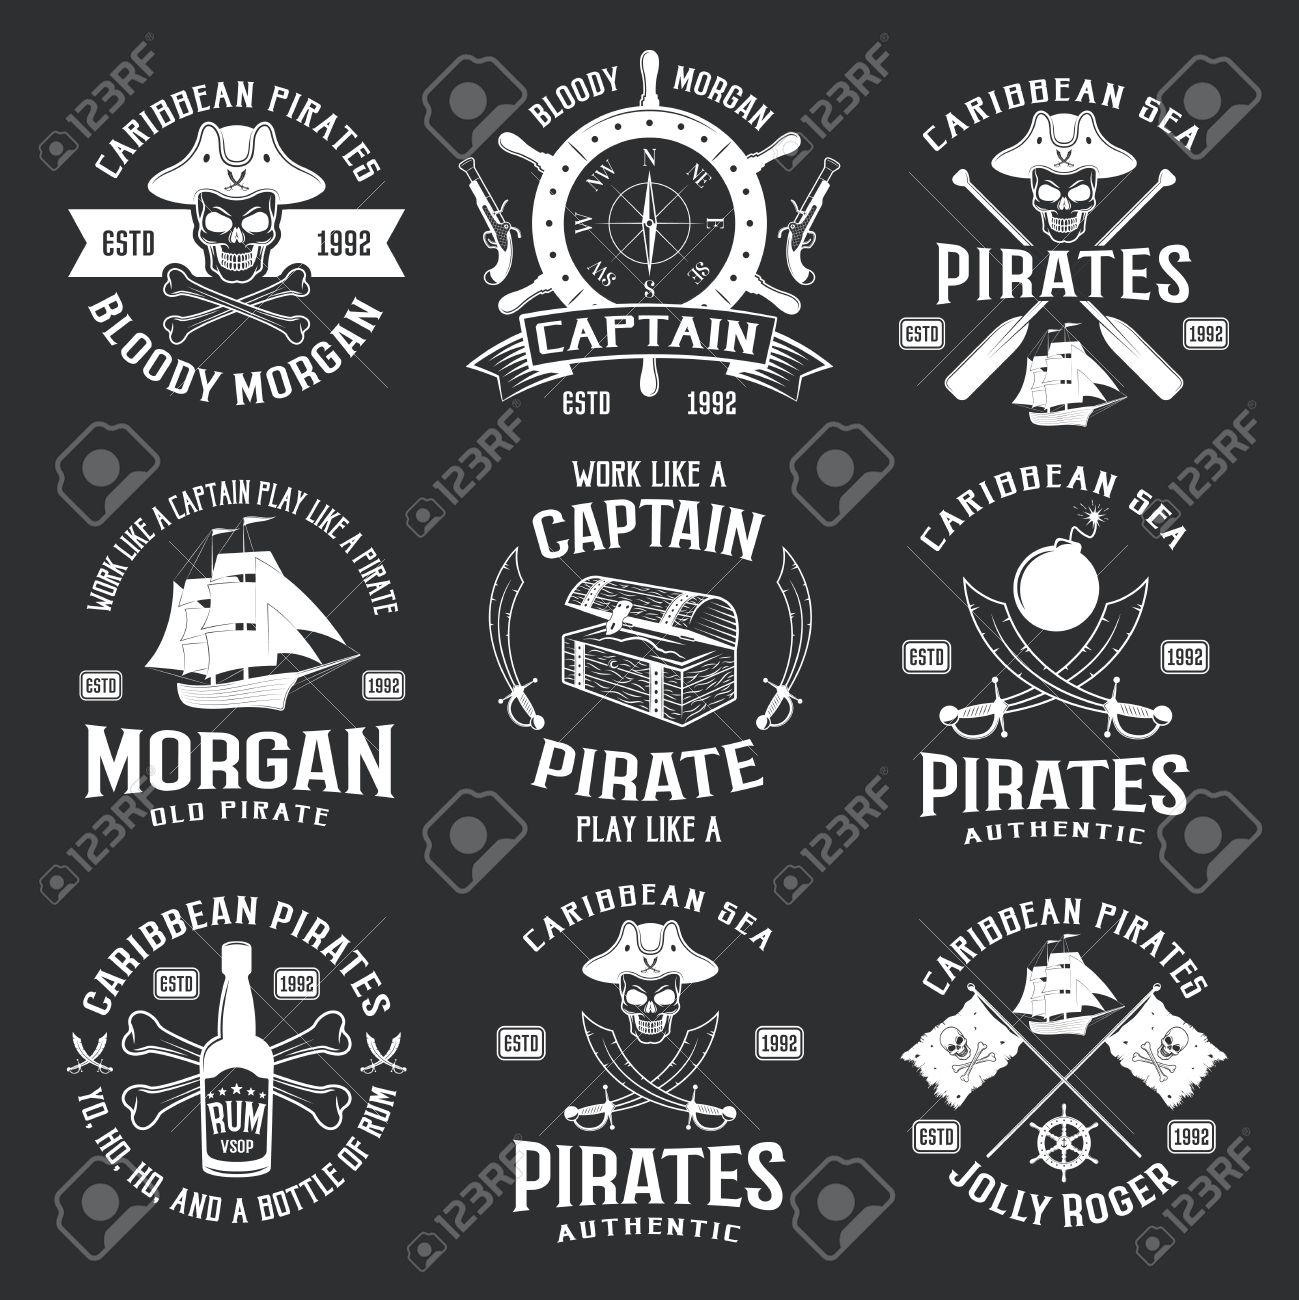 Caribbean pirates monochrome emblems with helm ship pistol saber caribbean pirates monochrome emblems with helm ship pistol saber jolly roger on black background isolated vector buycottarizona